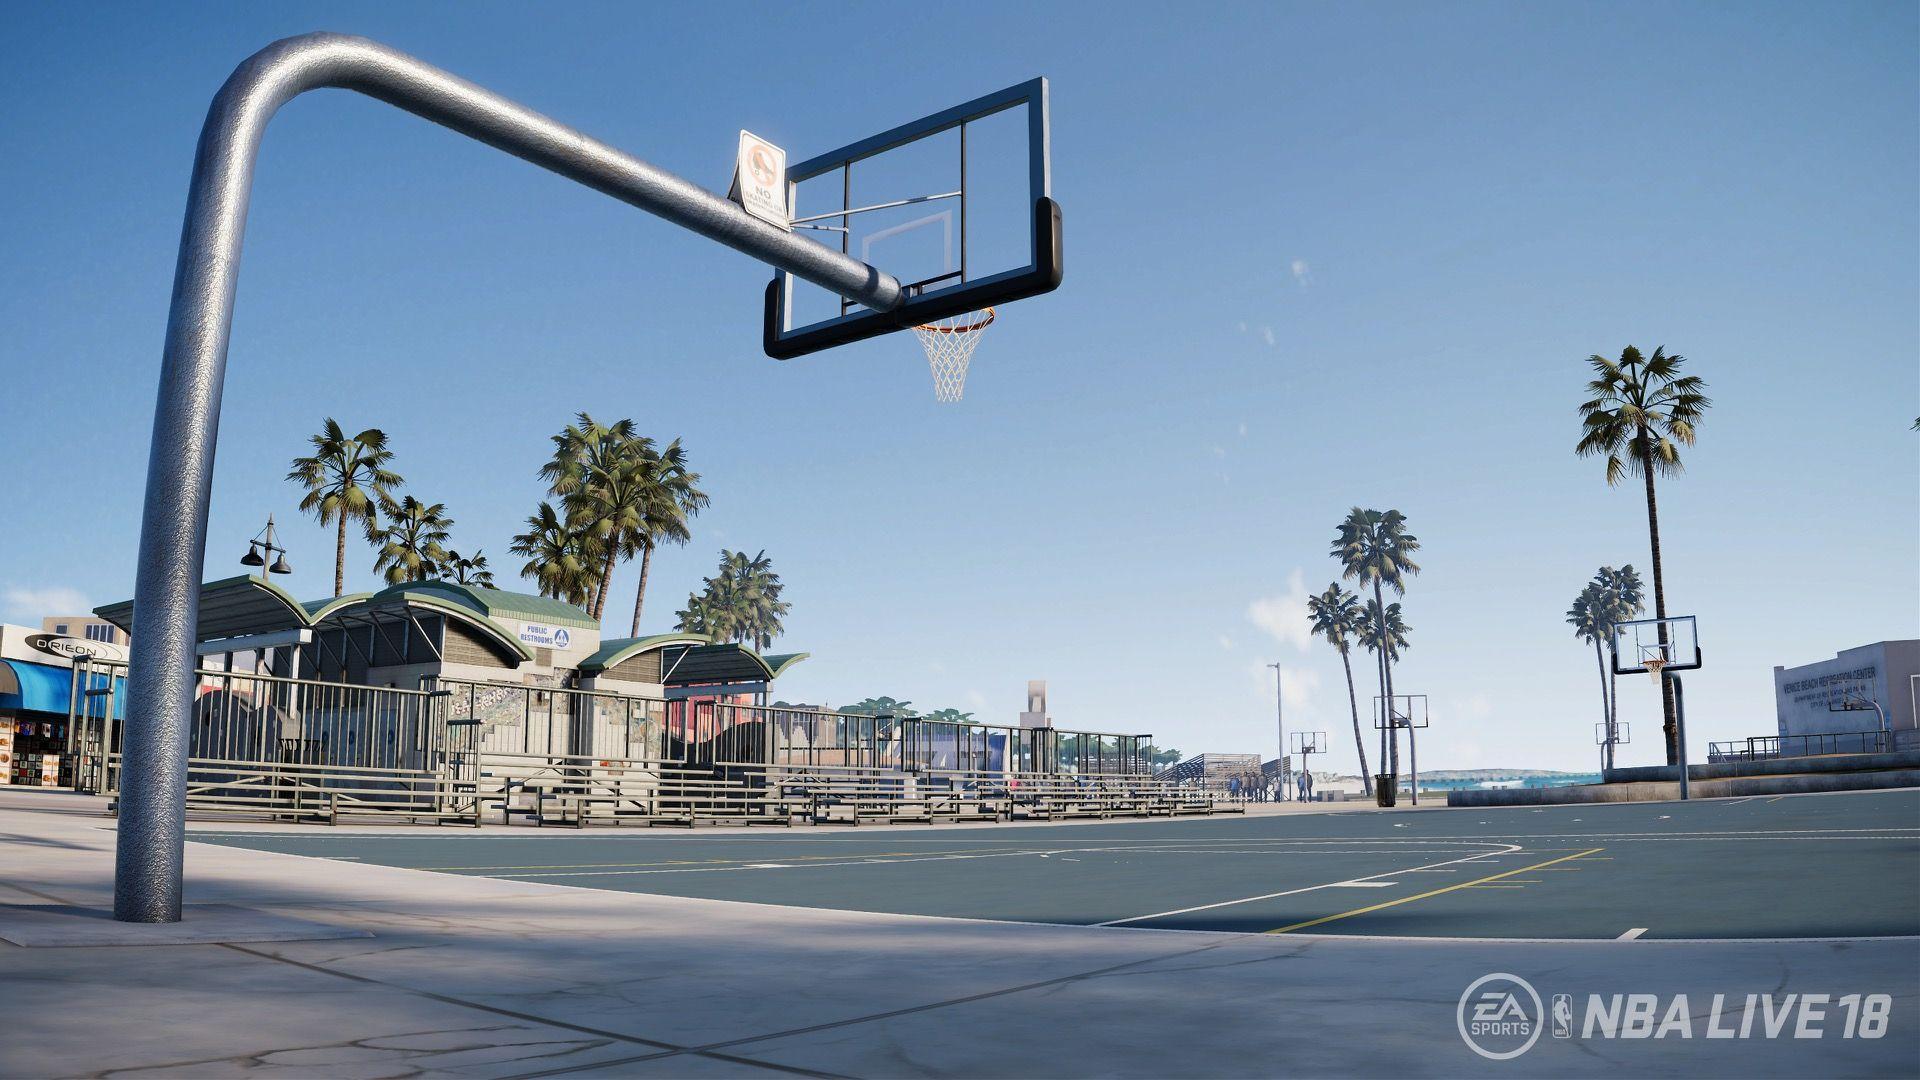 NBA Live 18 - Xbox One - www.GameInformer.com